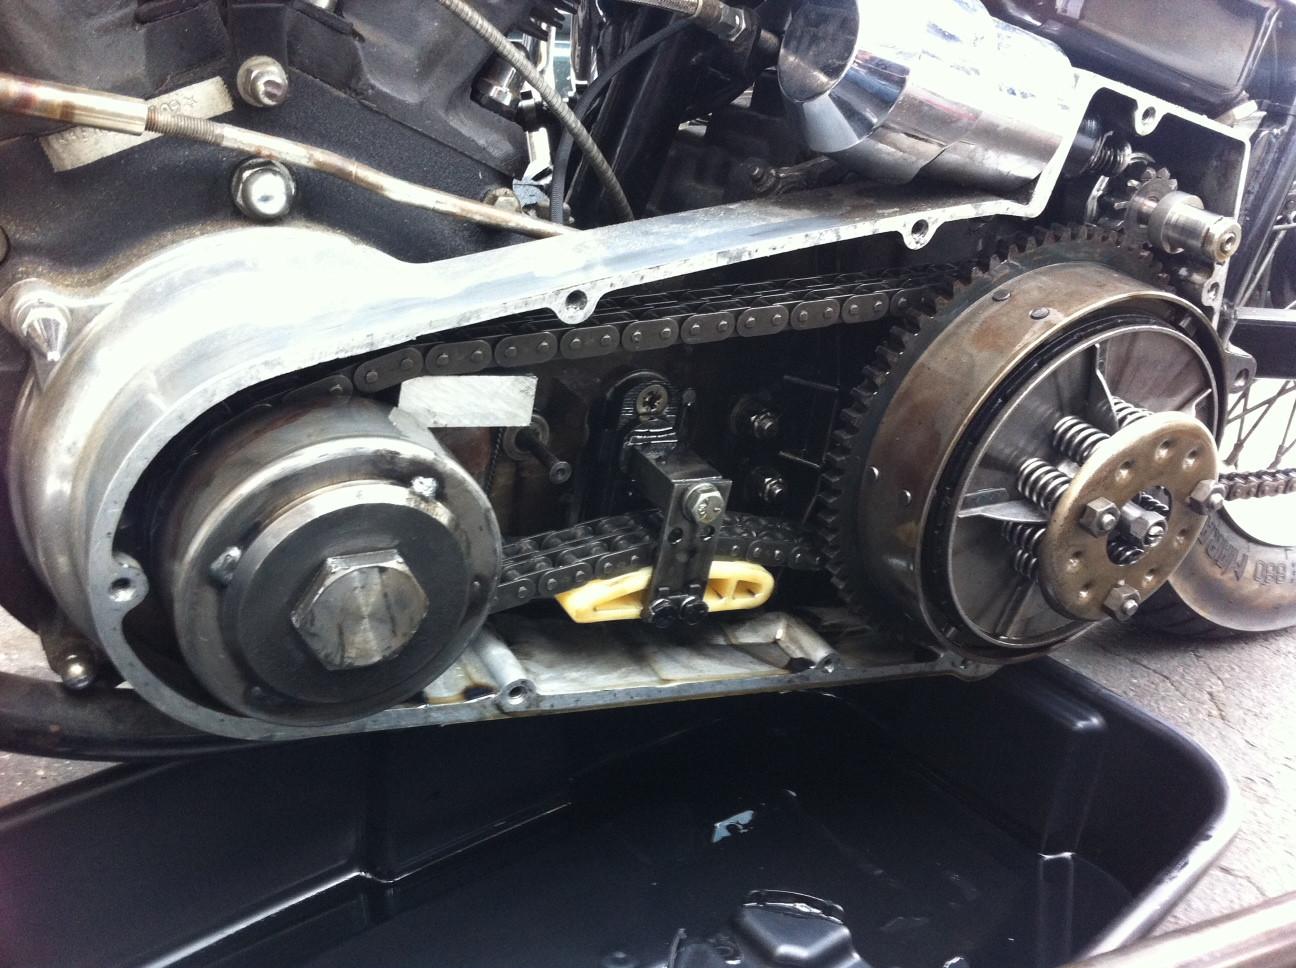 Stage 1 Mods Complete - 1130cc.com: The #1 Harley Davidson